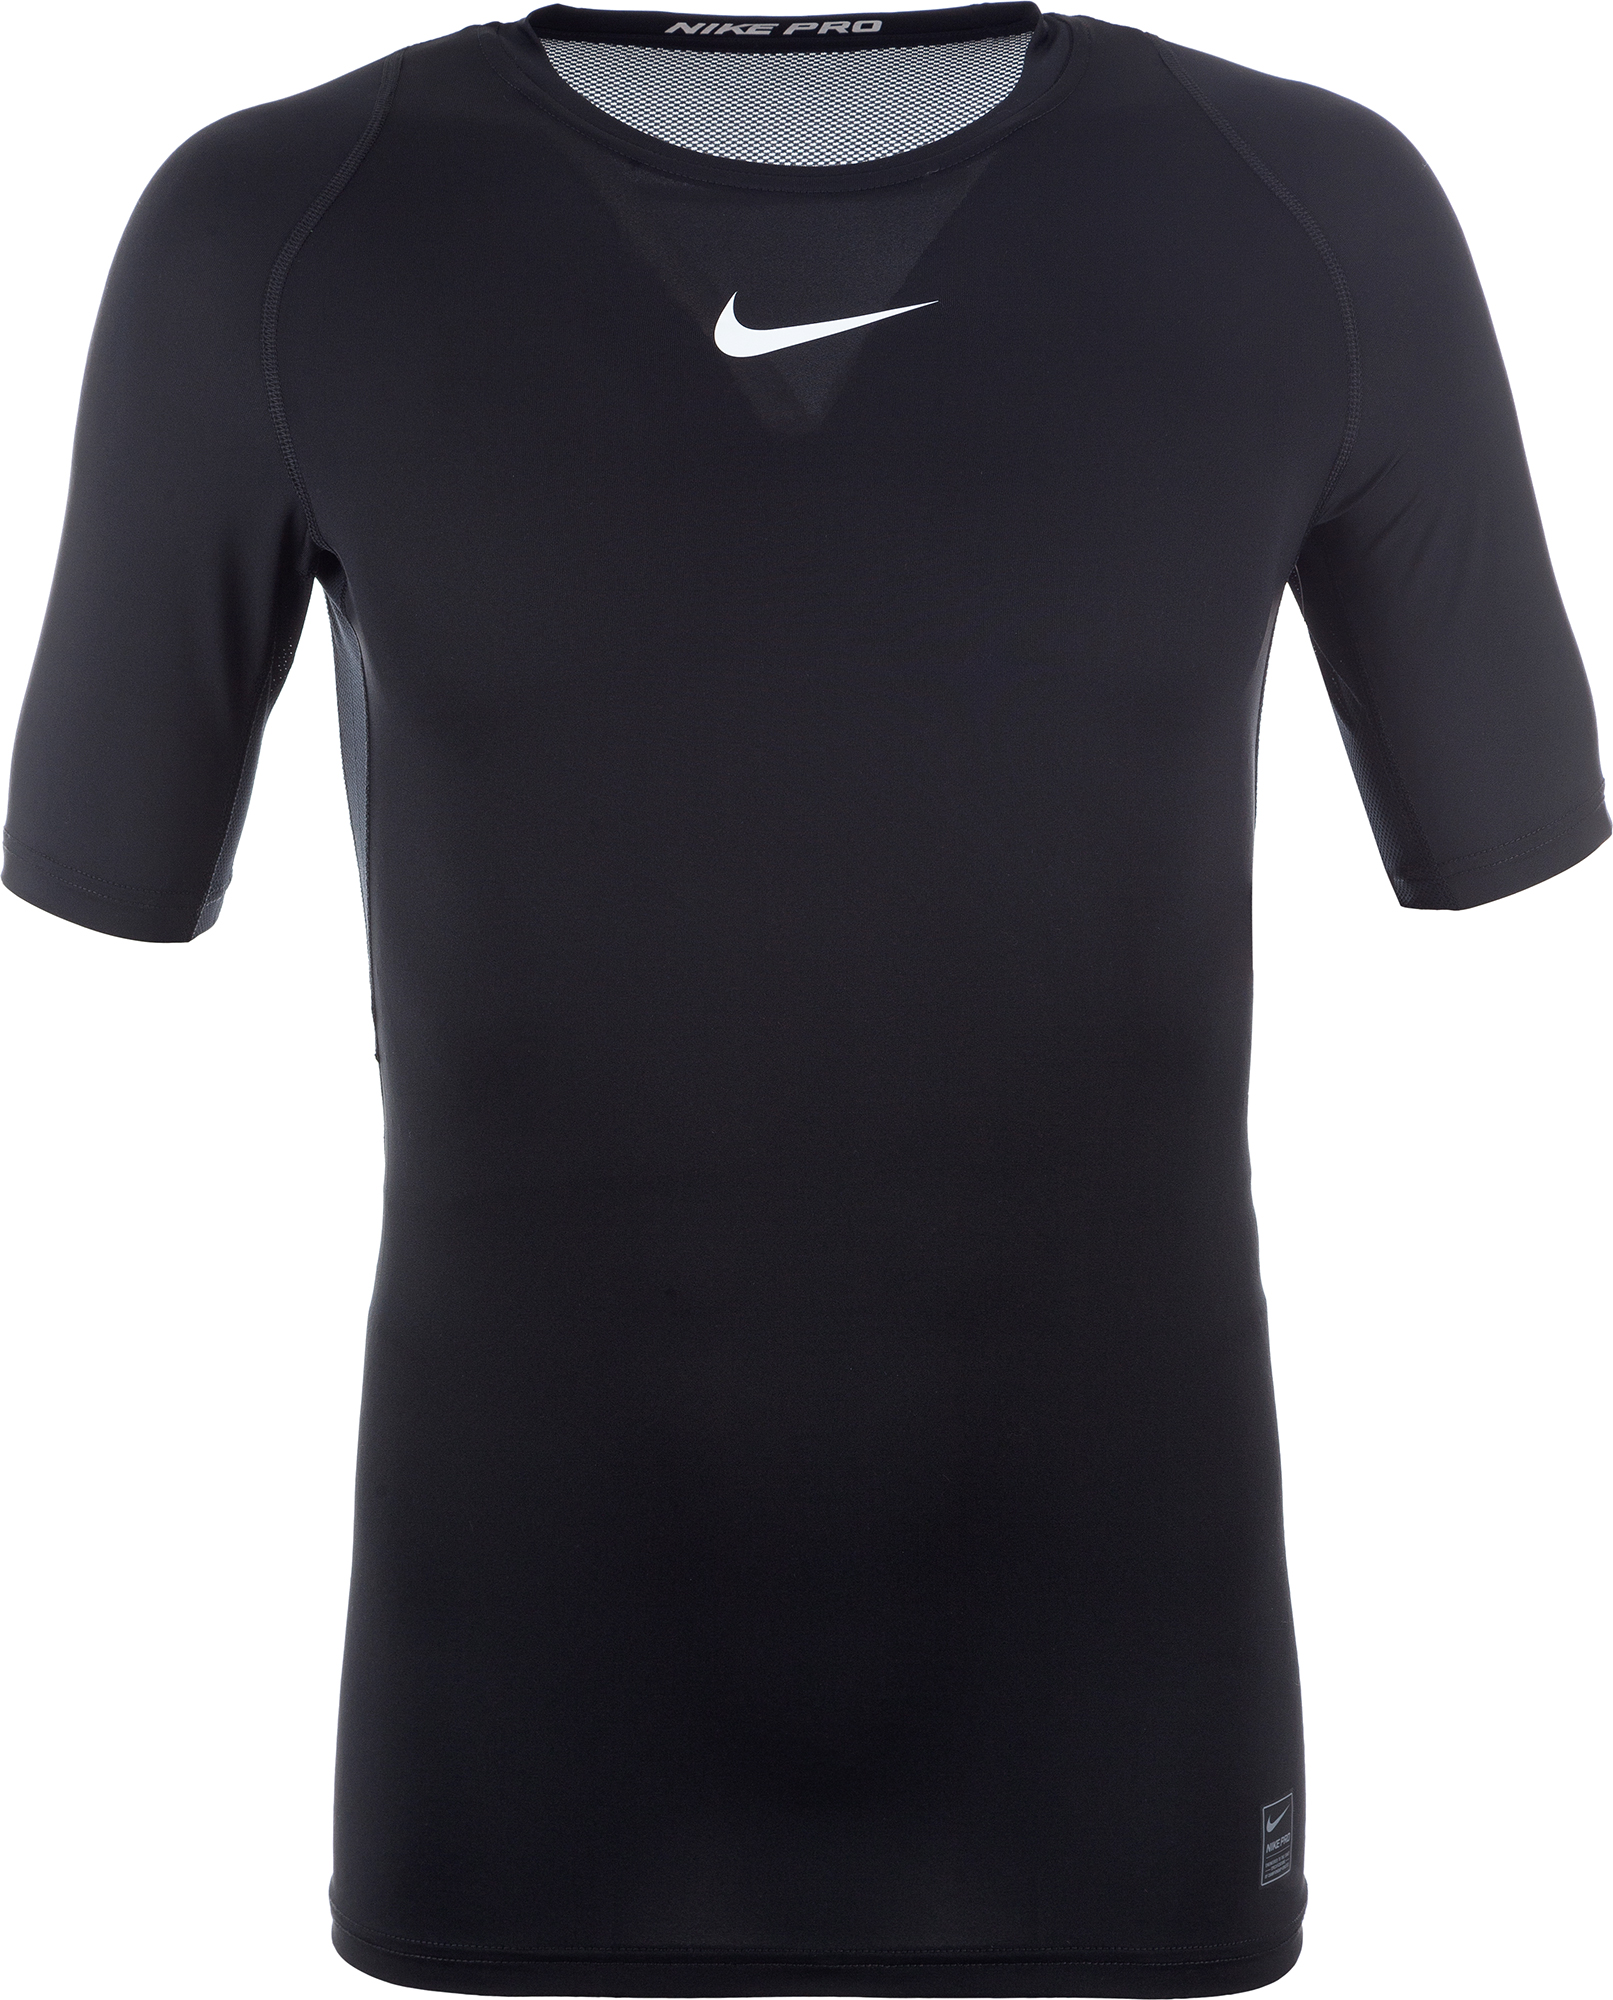 Фото Nike Футболка мужская Nike Pro, размер 52-54